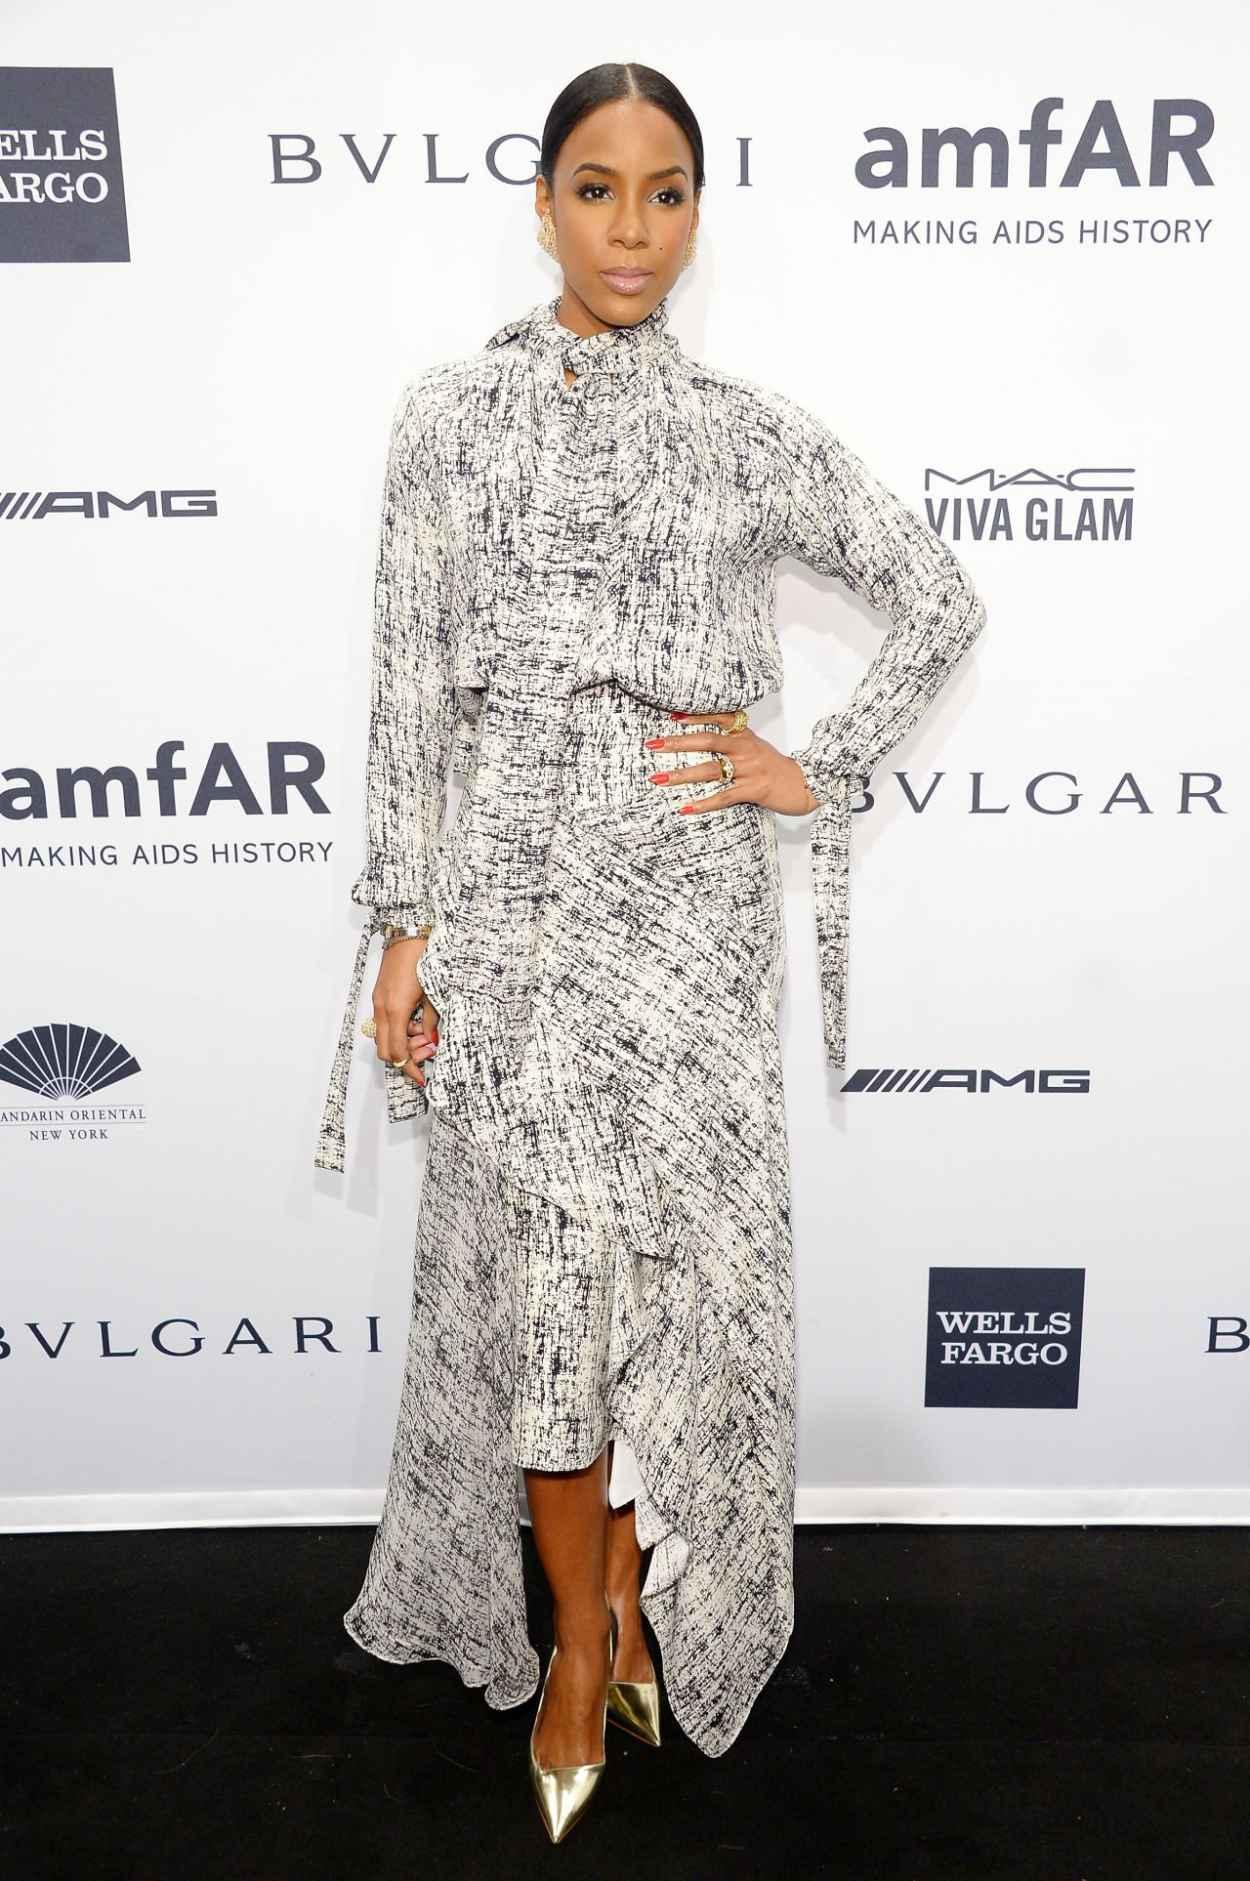 Kelly Rowland Wearing Juan Carlos Obando Dress at 2015 amfAR New York Gala New York City-2